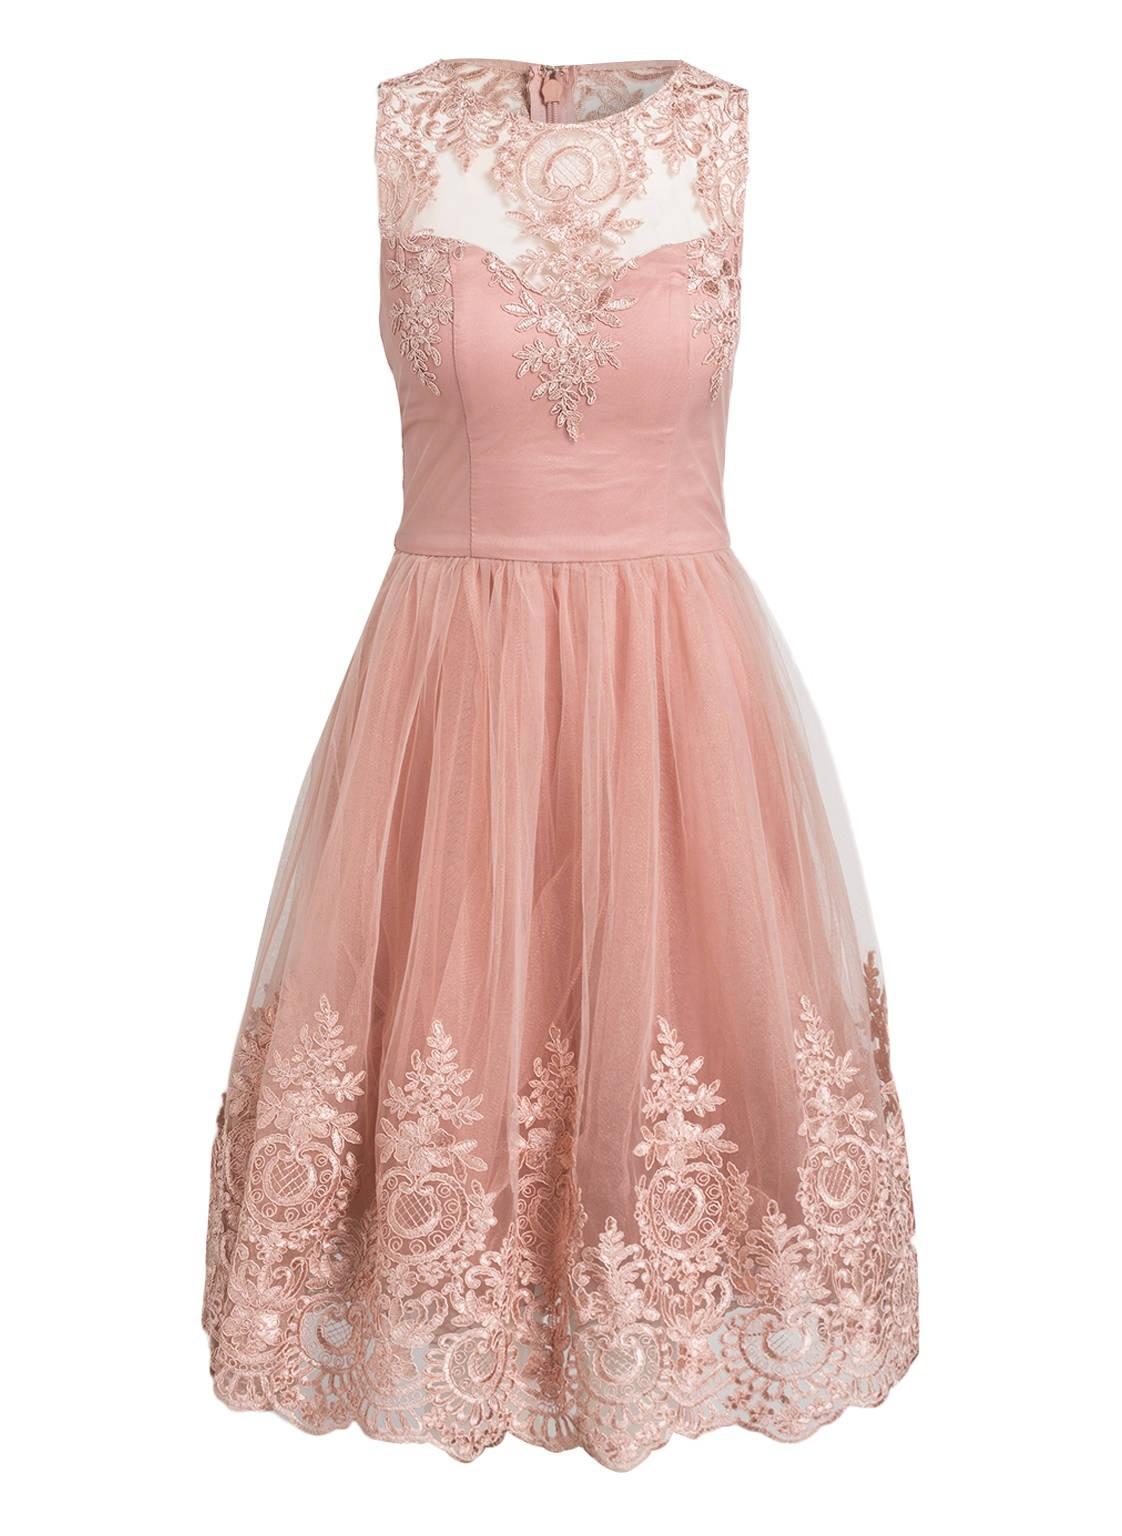 10 Wunderbar Kleid Altrosa Knielang Boutique15 Ausgezeichnet Kleid Altrosa Knielang Bester Preis